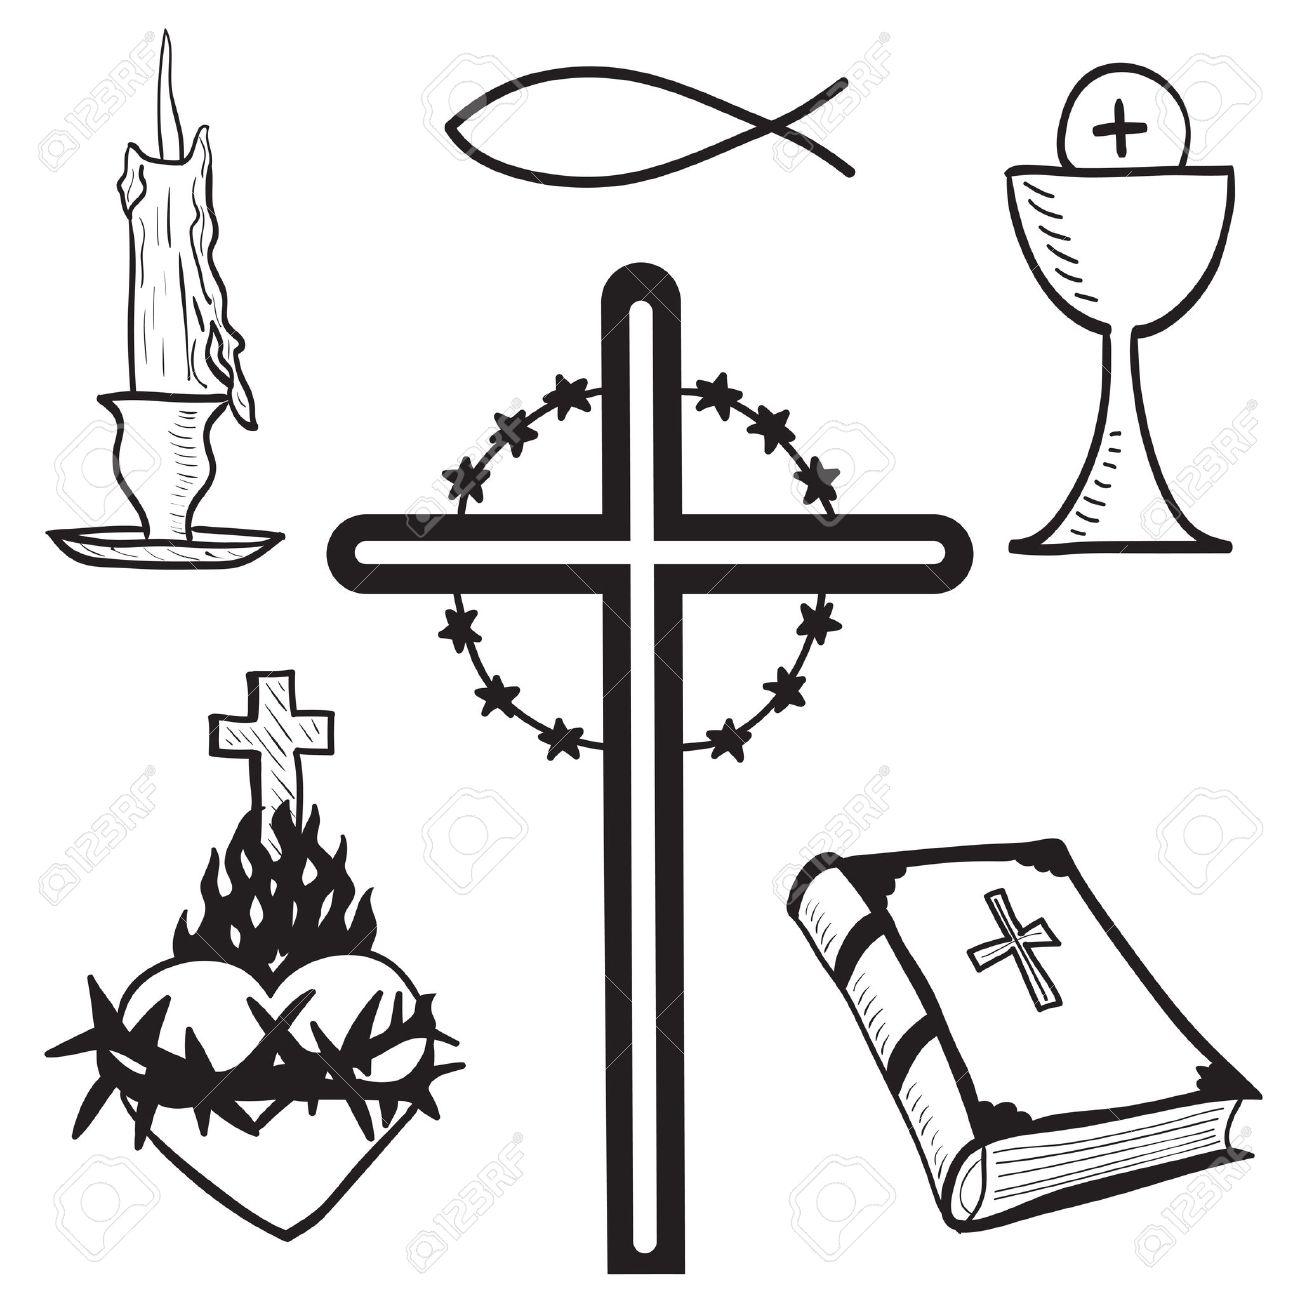 Catholic clipart roman catholic. Cross drawing at getdrawings